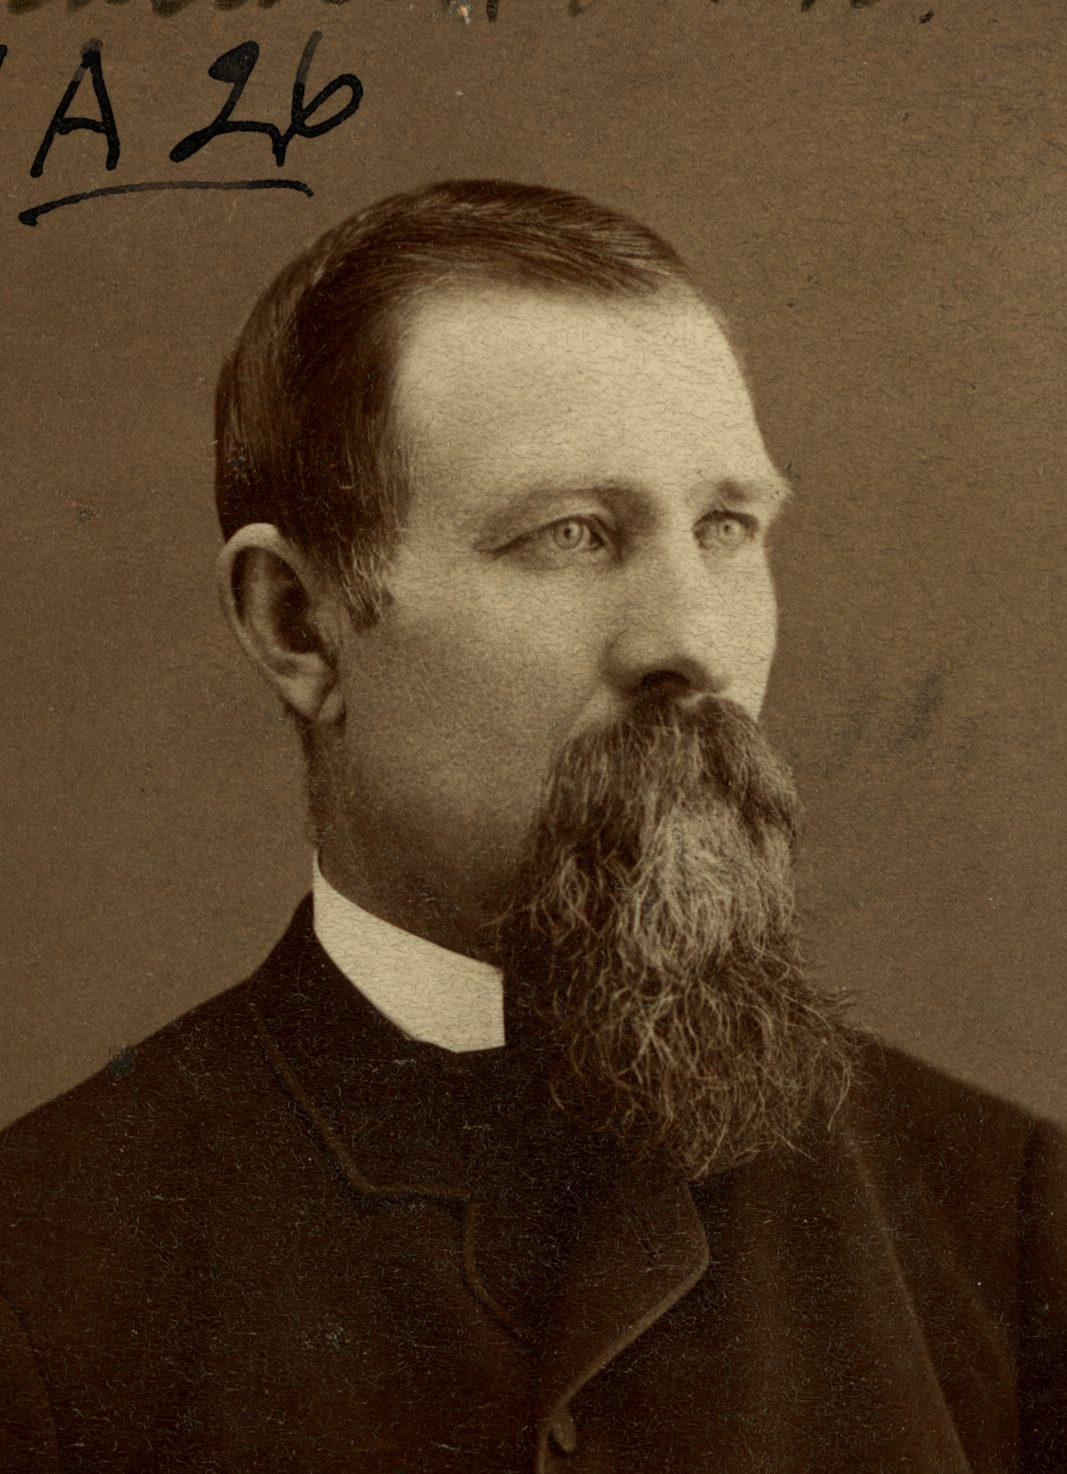 Anderson, August Kull